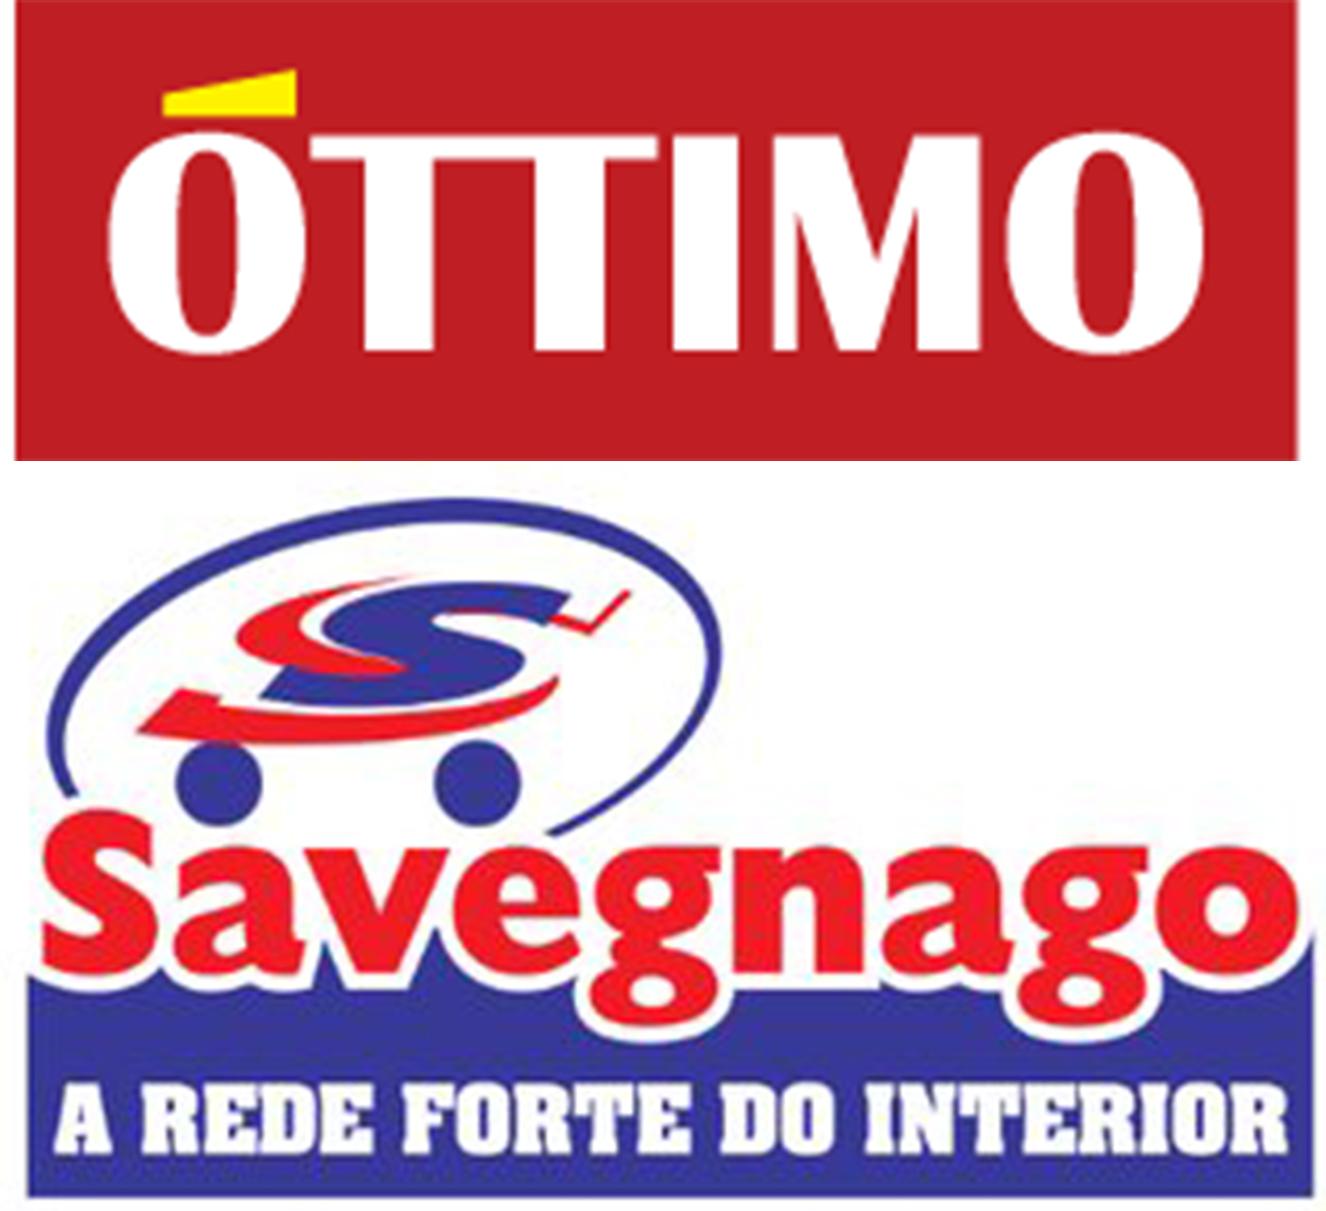 ÓTTIMO/SAVEGNAGO